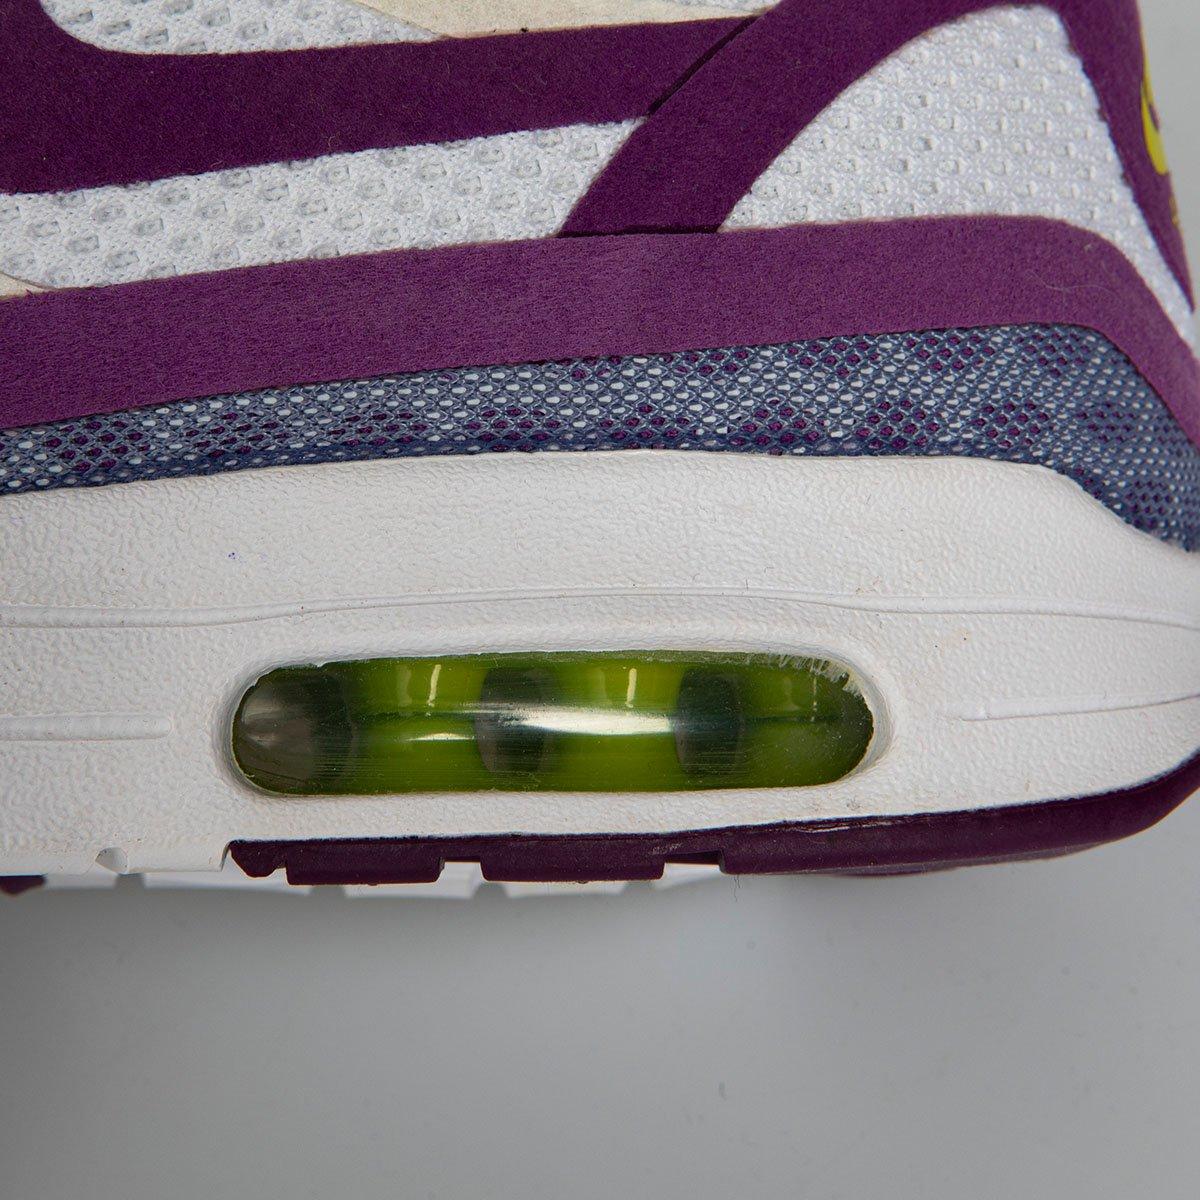 Sneakers Nike WMNS Air Max 1 desert